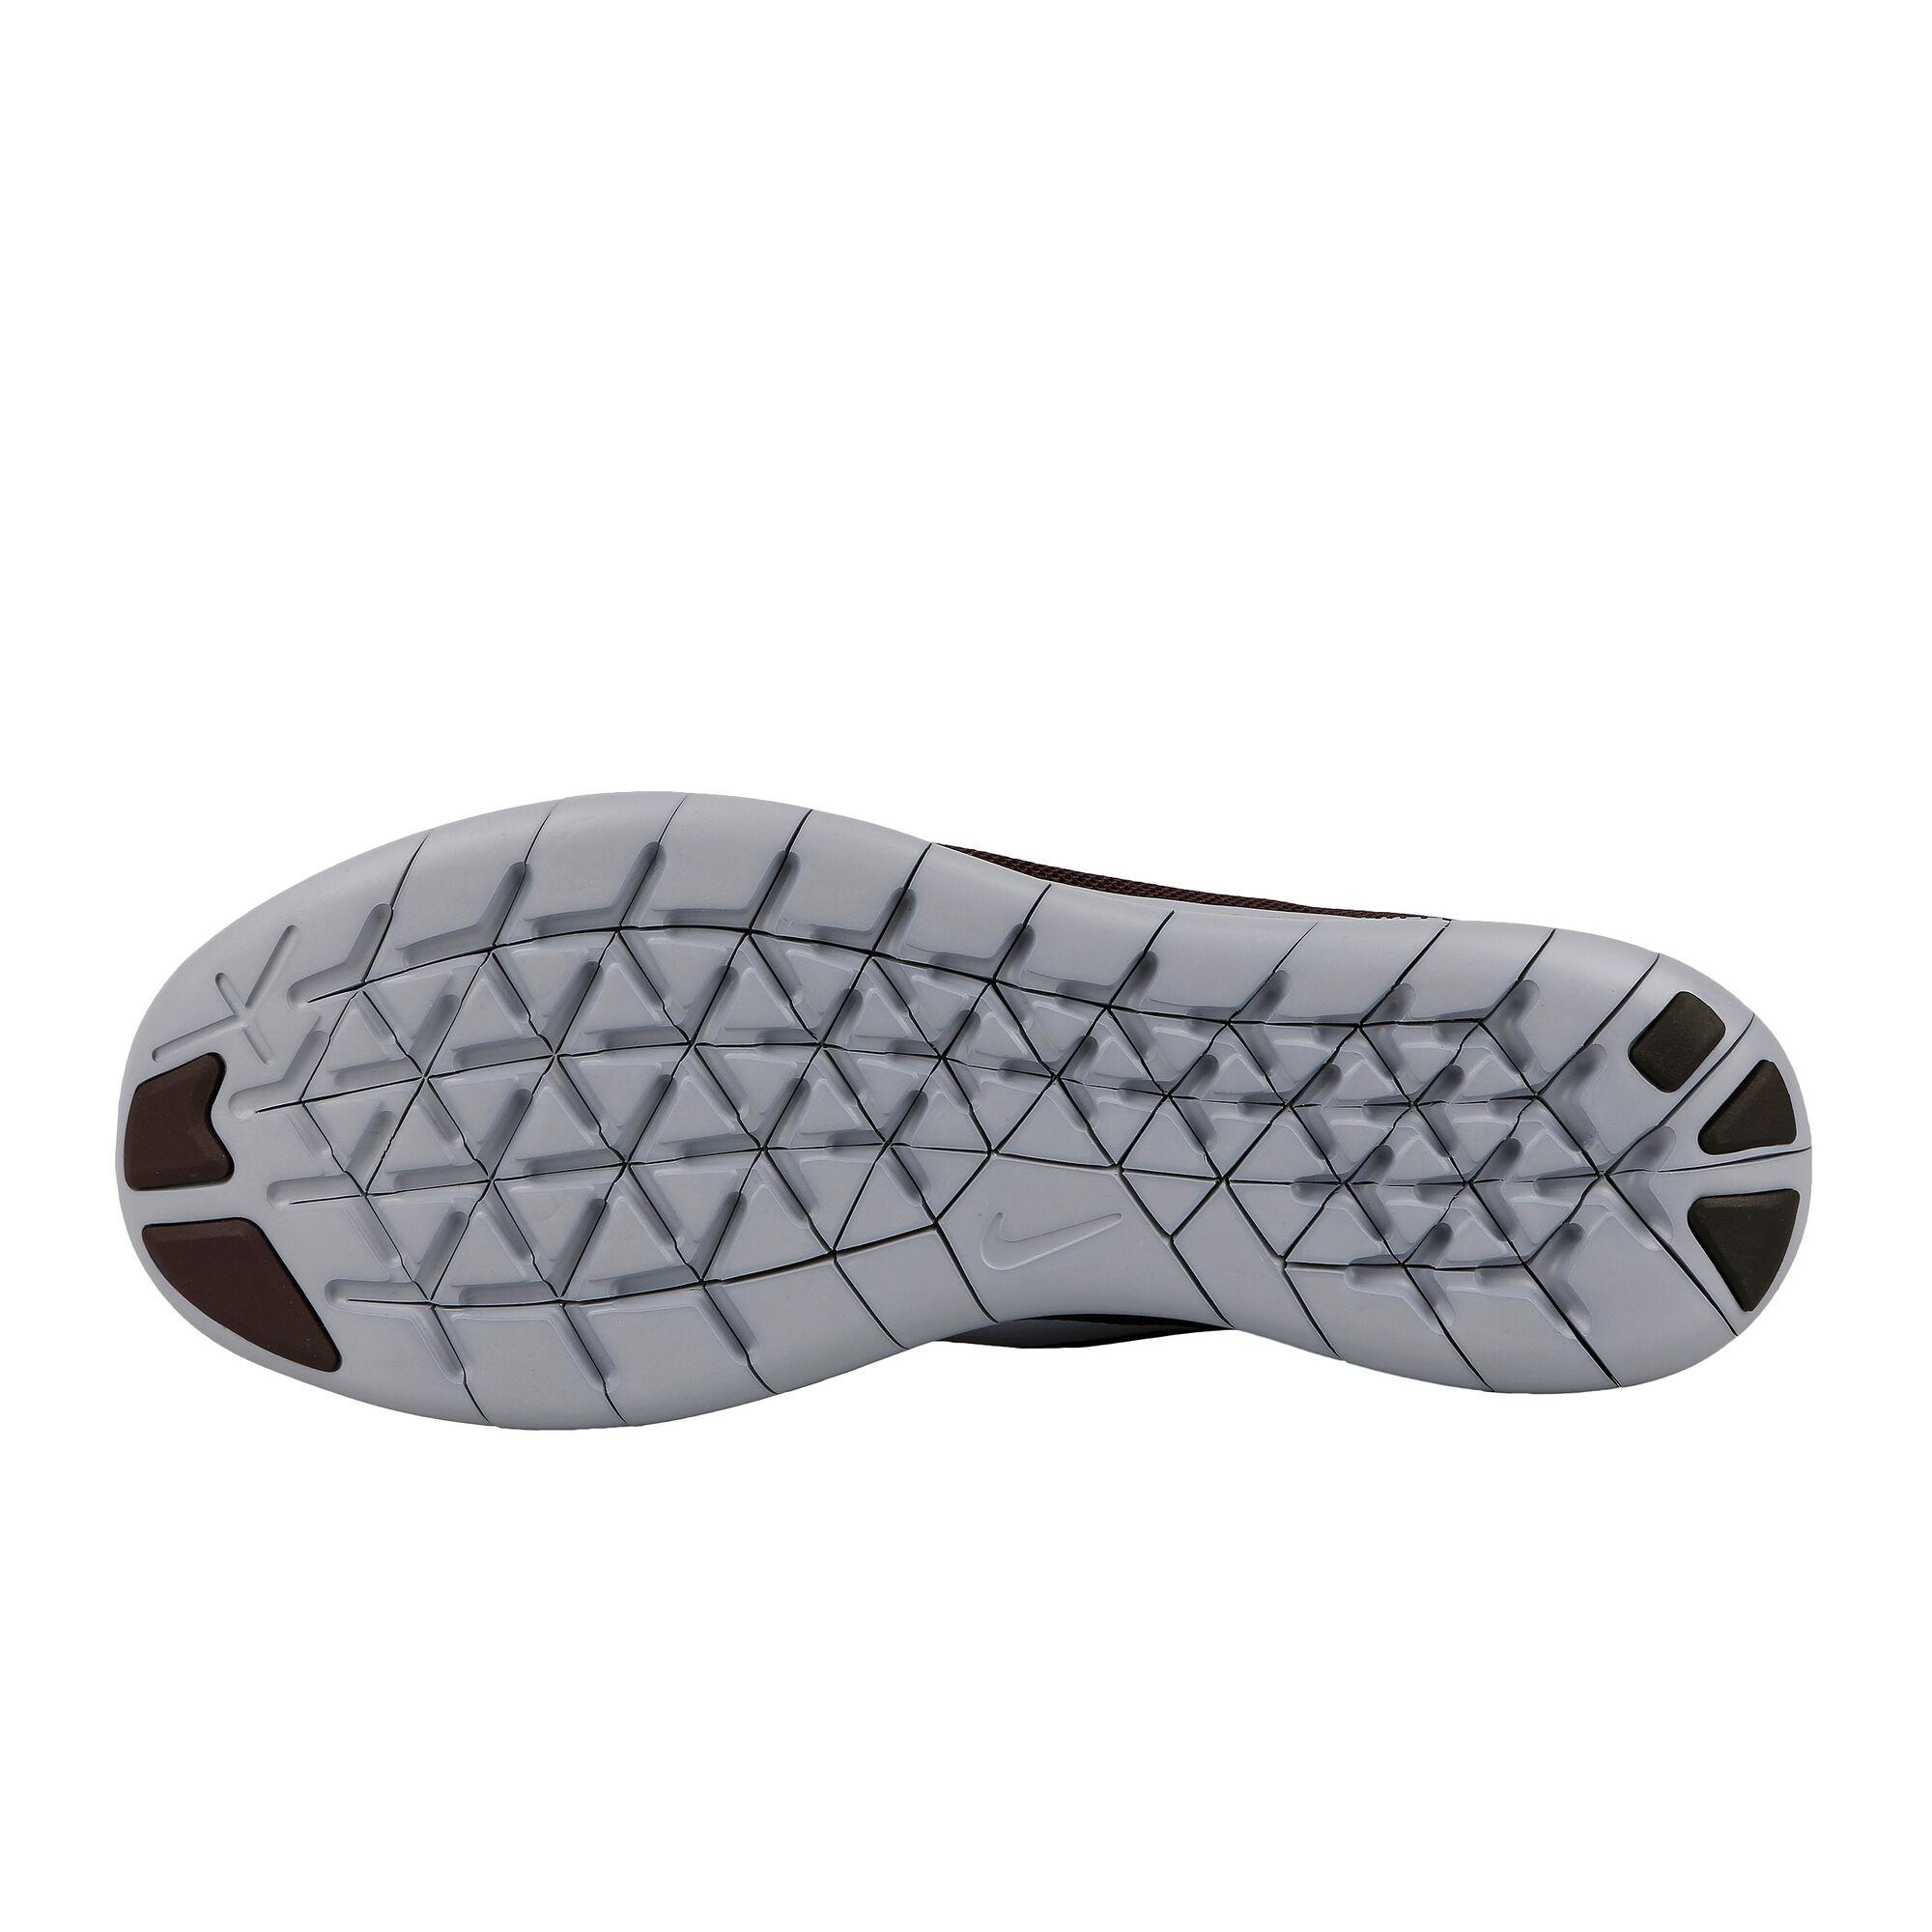 ddf18bede18f0 buy Nike Free Run 2017 Natural Running Shoe Men - Black